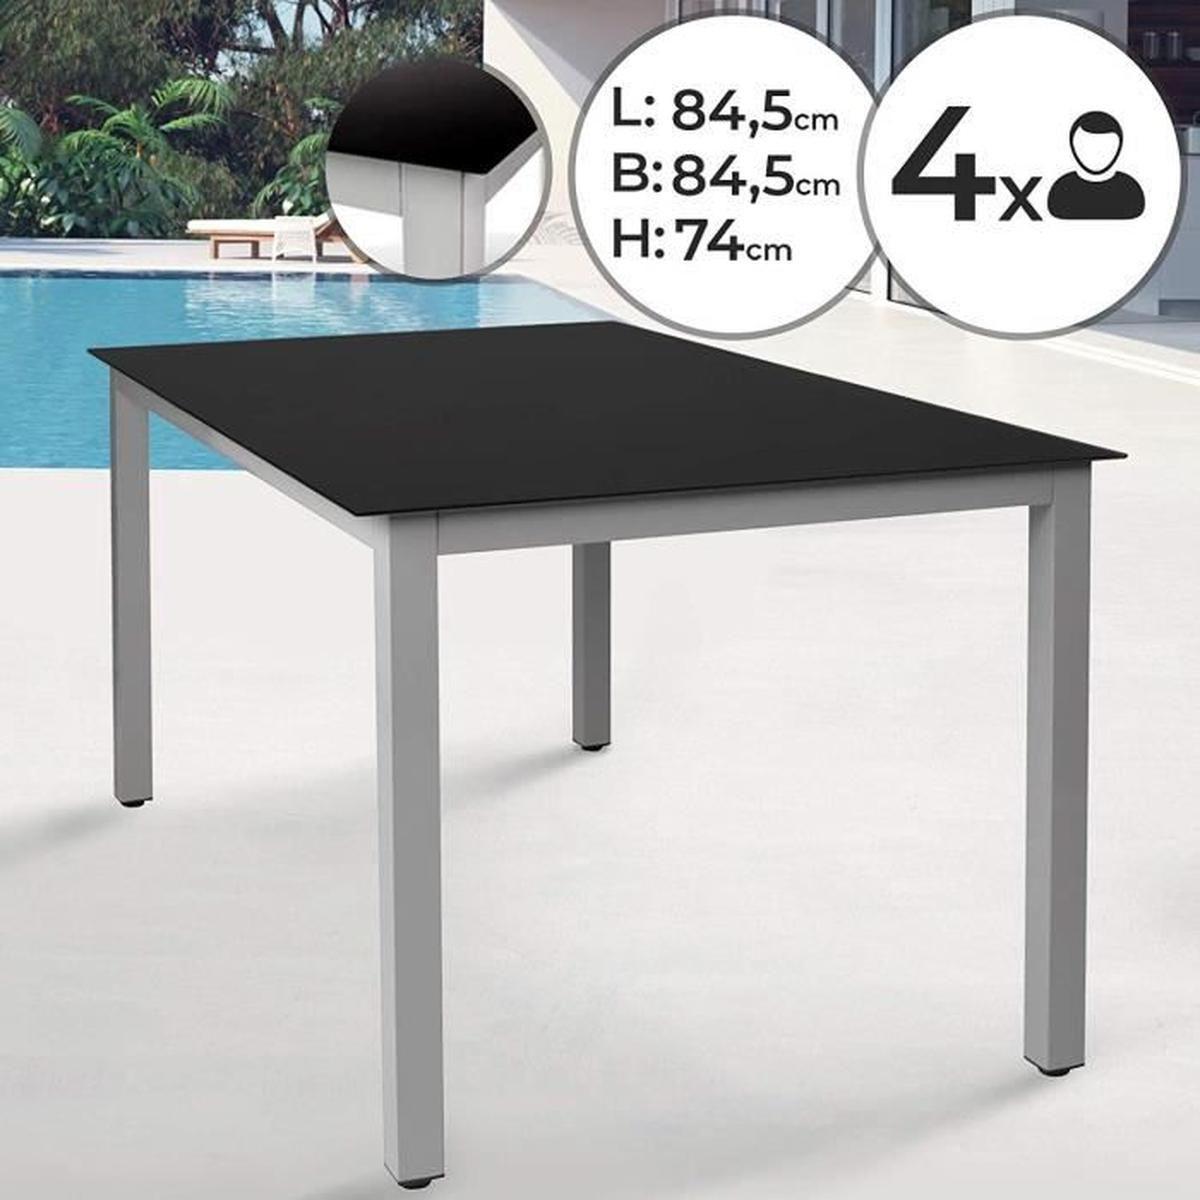 Aluminium Table De Jardin   85X85X74Cm, 4 Personnes, Avec Un ... intérieur Table De Jardin Aluminium Et Verre